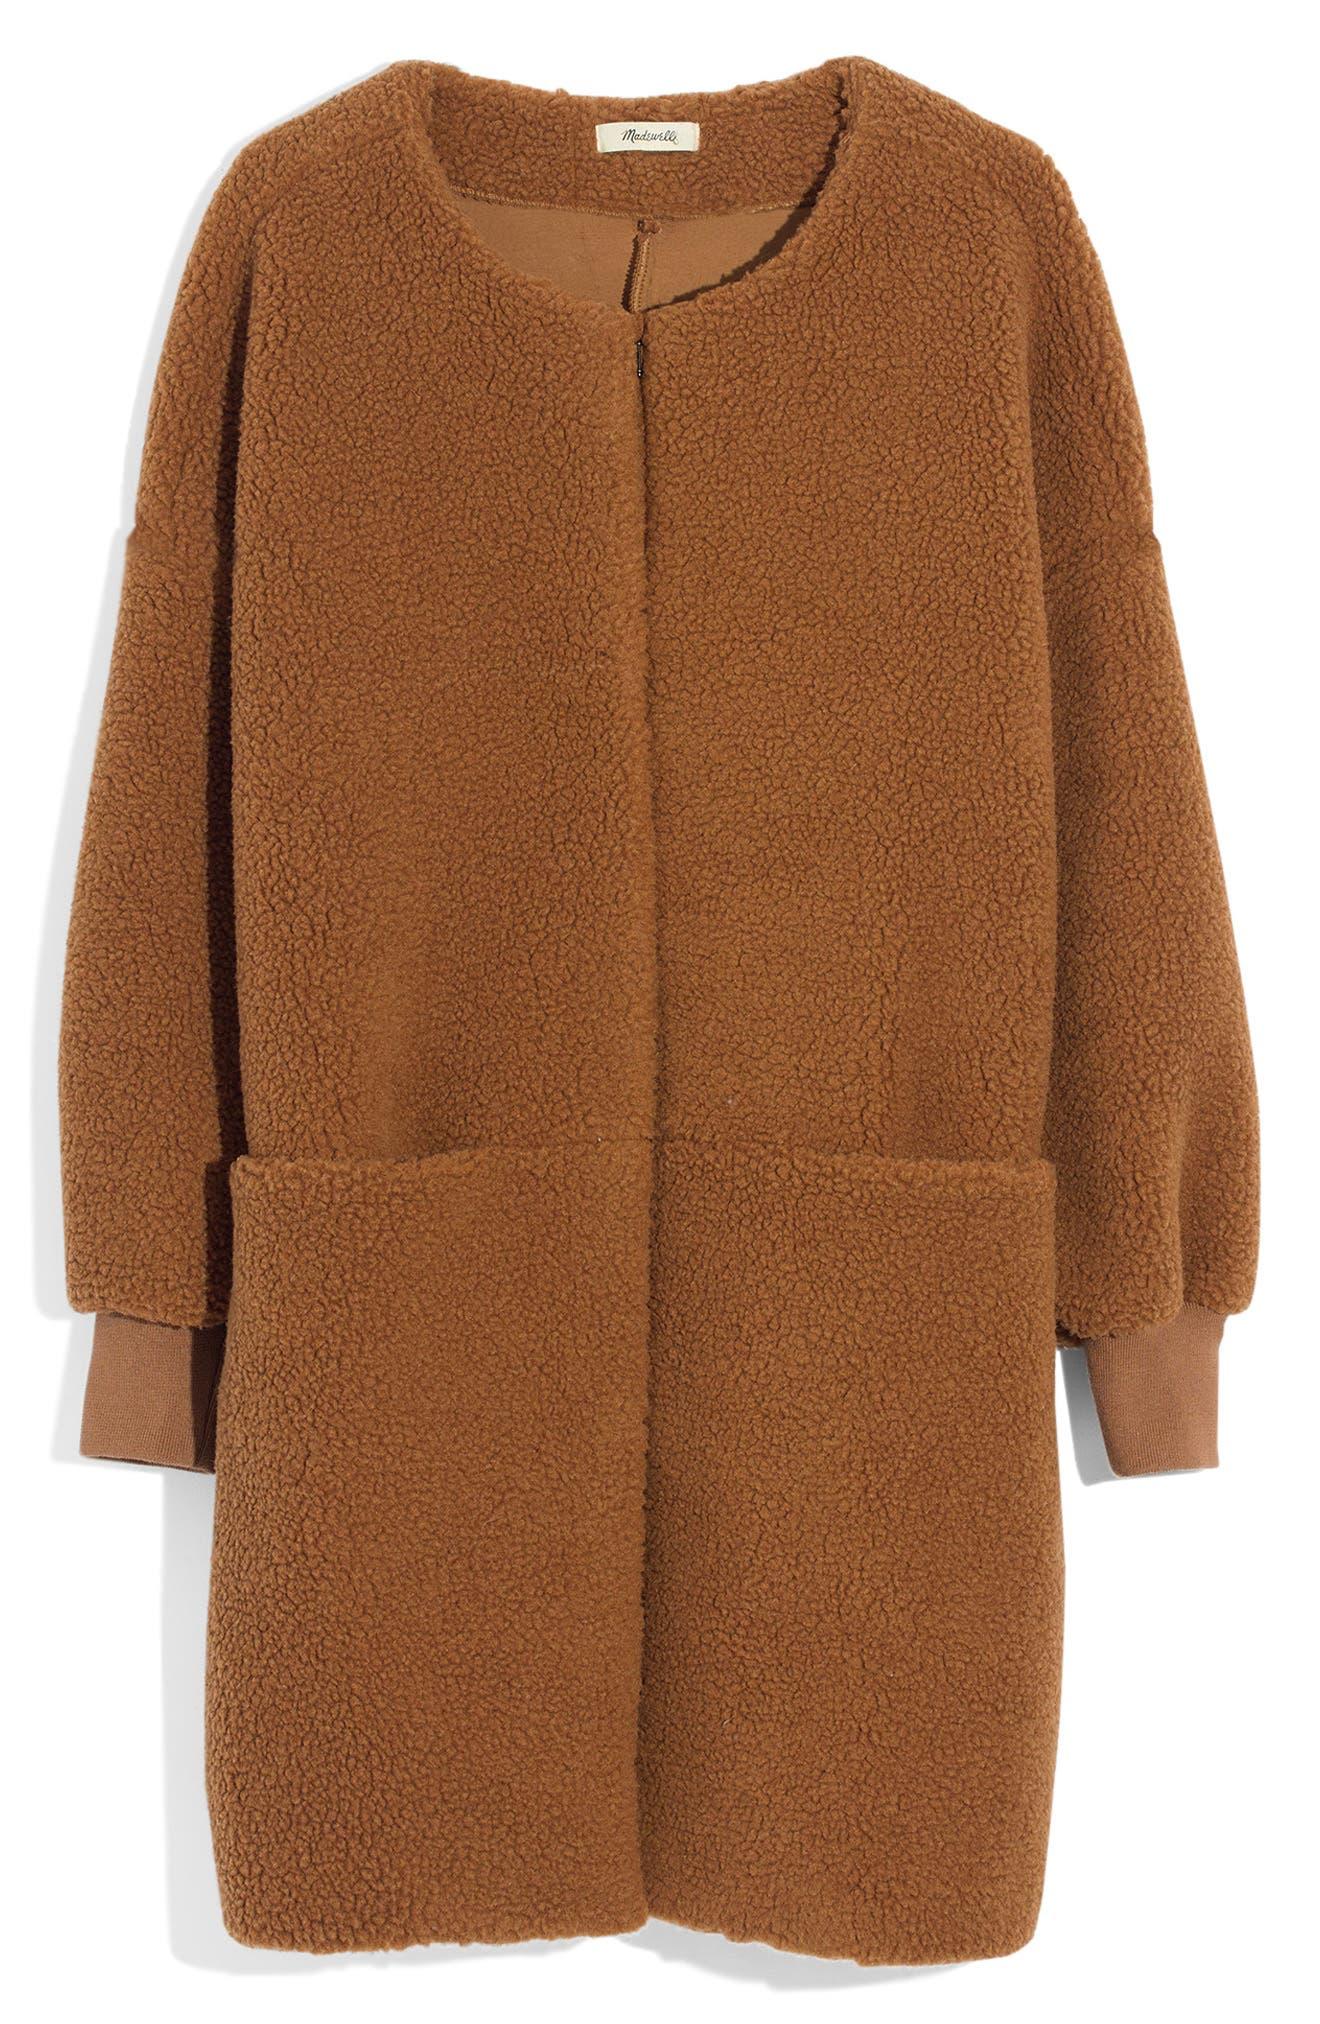 MADEWELL, Bonded Fleece Cocoon Coat, Alternate thumbnail 6, color, 200